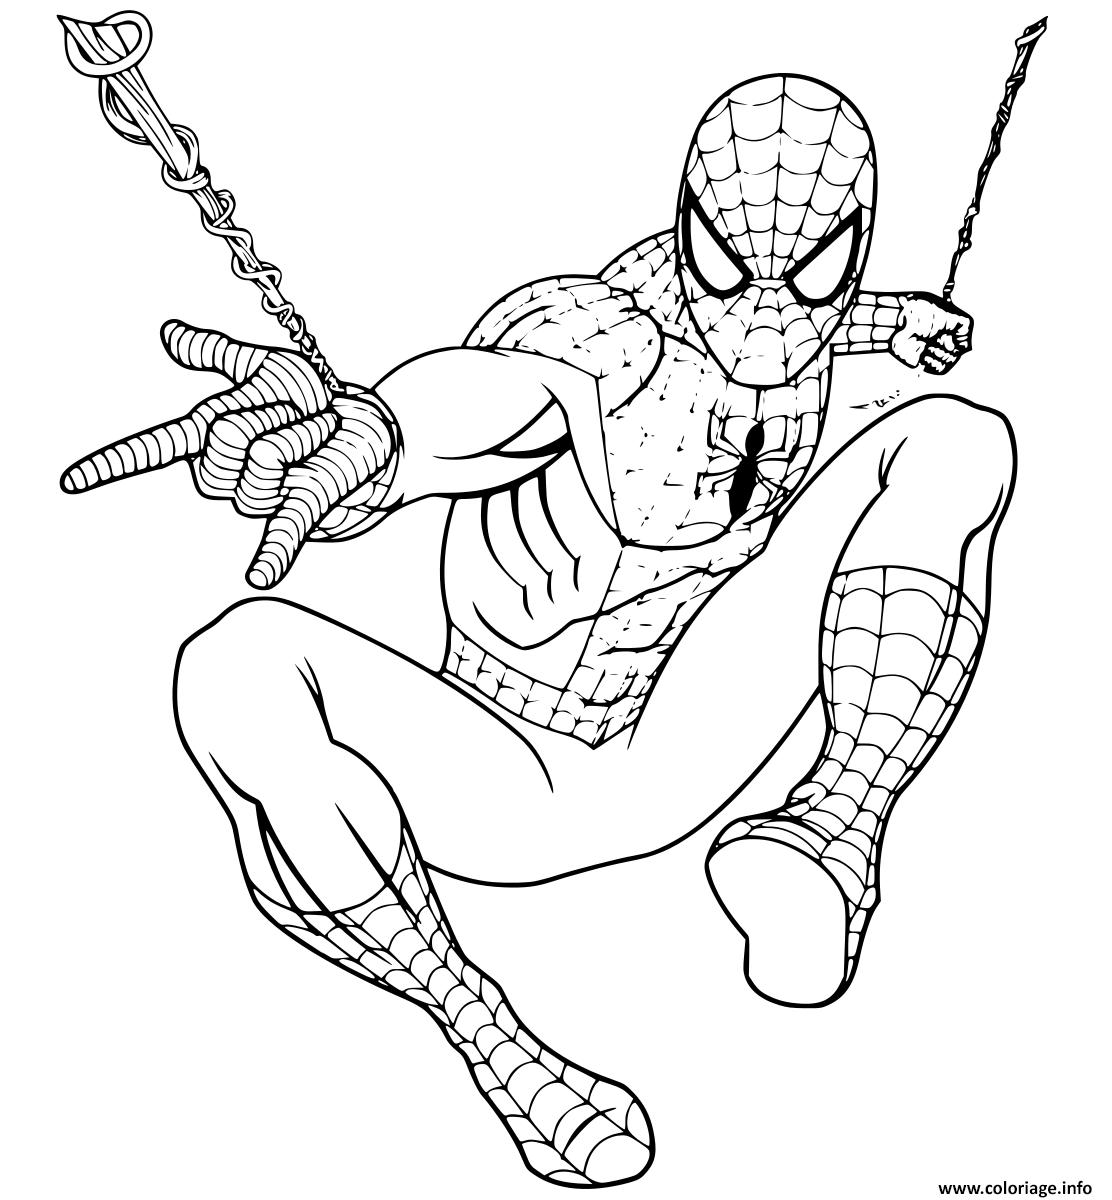 Dessin Spiderman returning to Marvel Universe Coloriage Gratuit à Imprimer